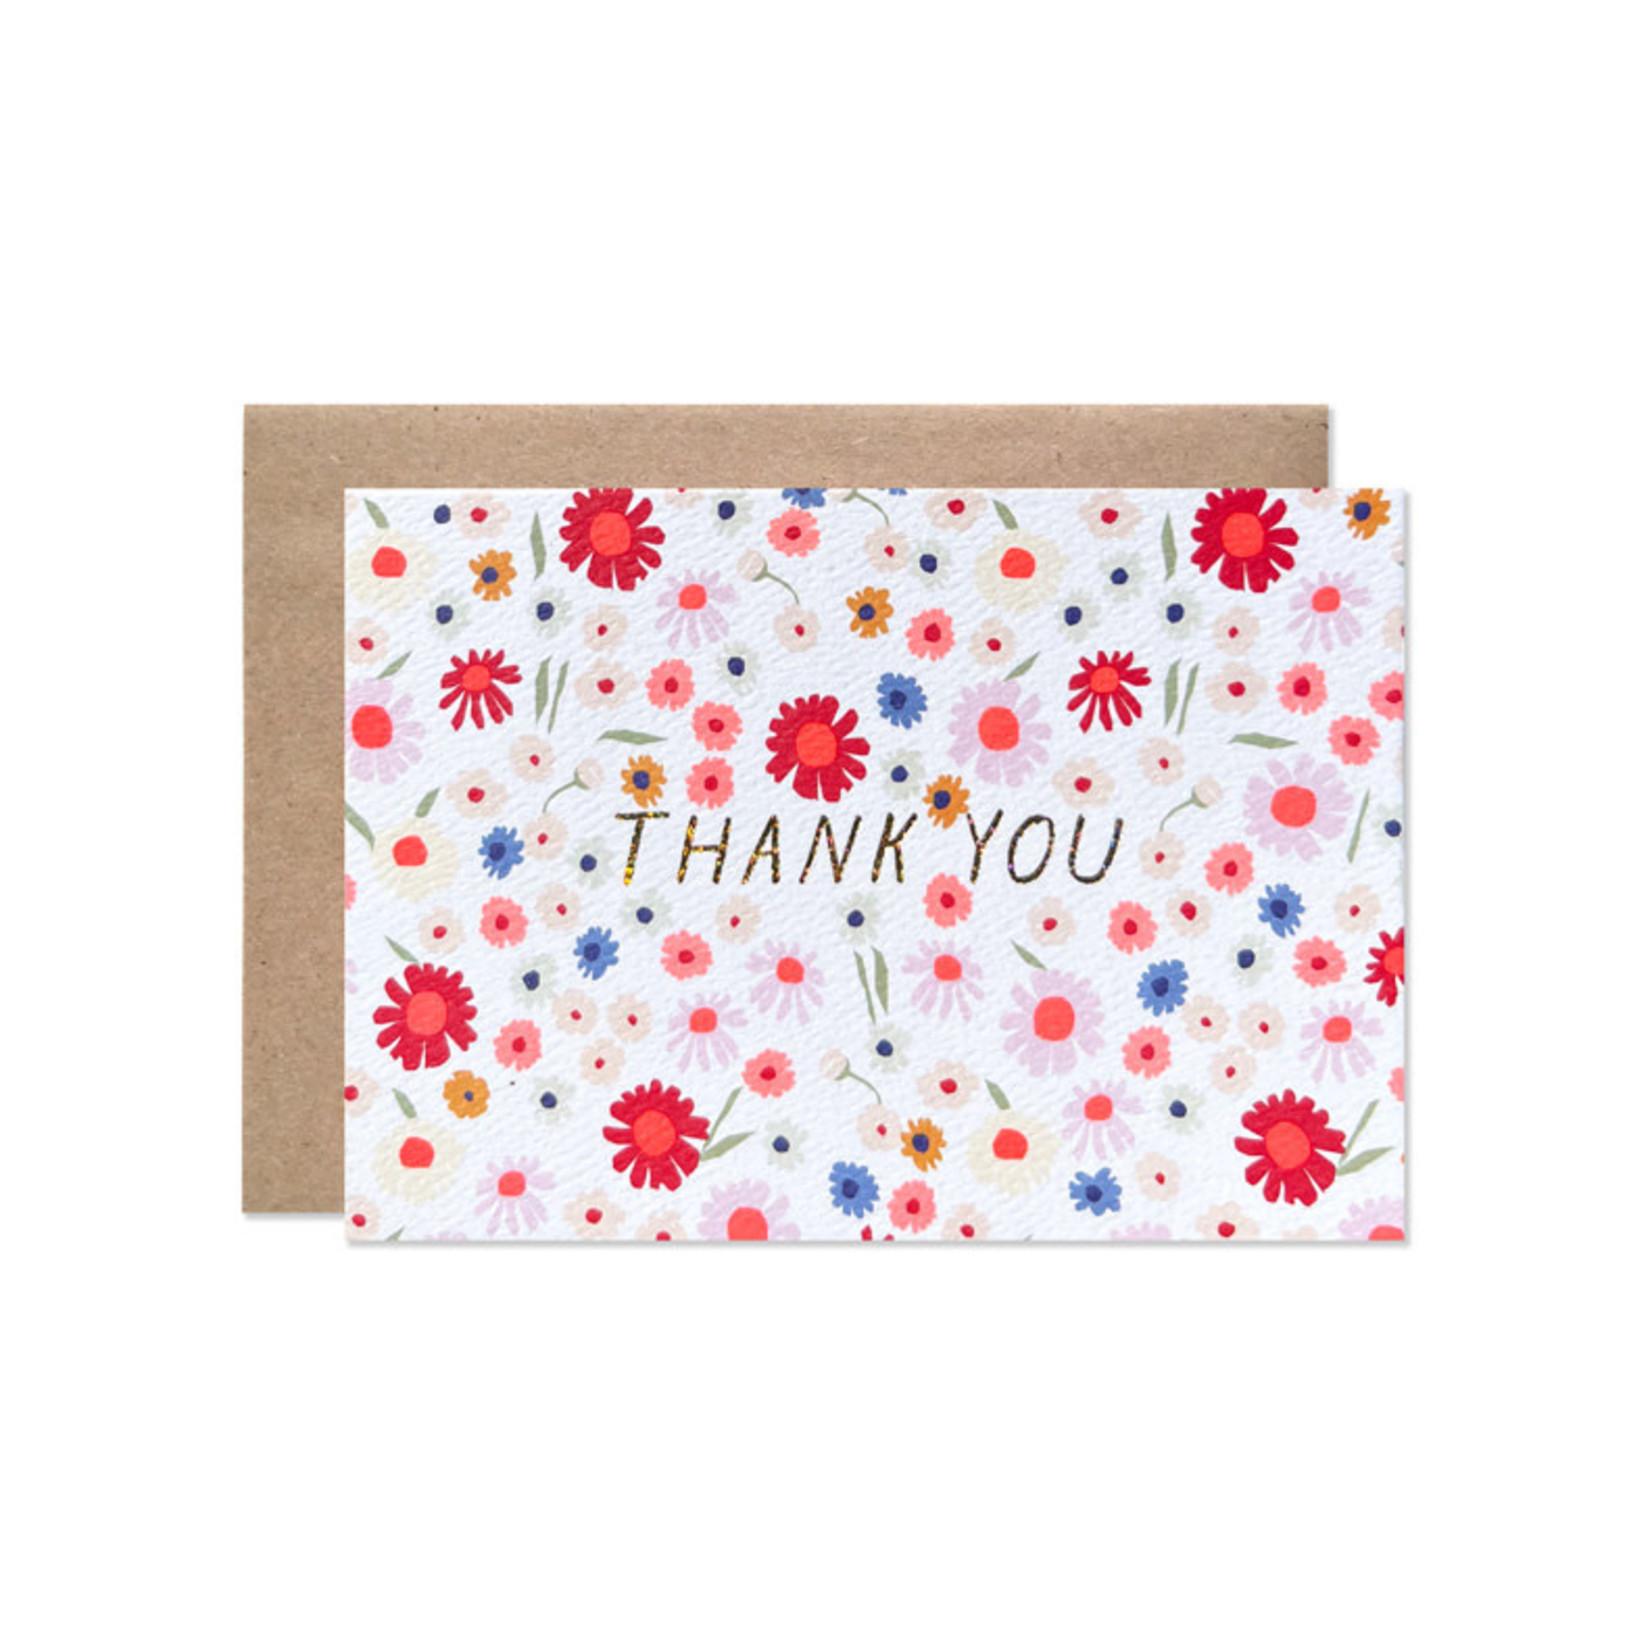 Hartland Brooklyn Hartland Brooklyn Box Set 8 - Thank You Brittani Floral with Gold Glitter Foil